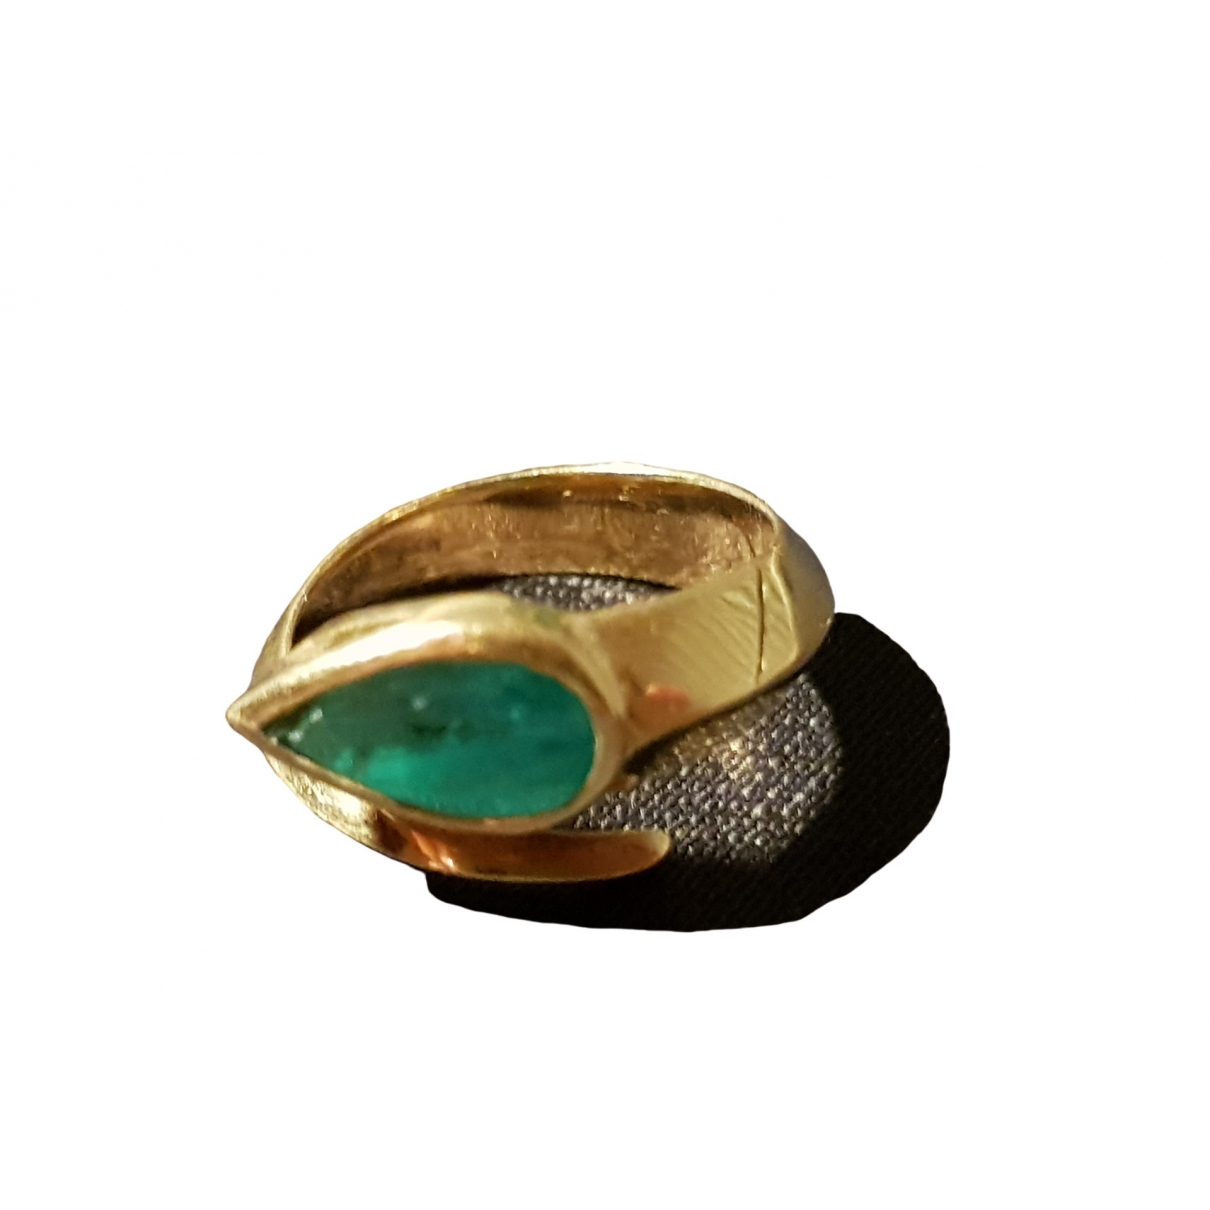 - Bague Emeraude pour femme en or jaune - vert